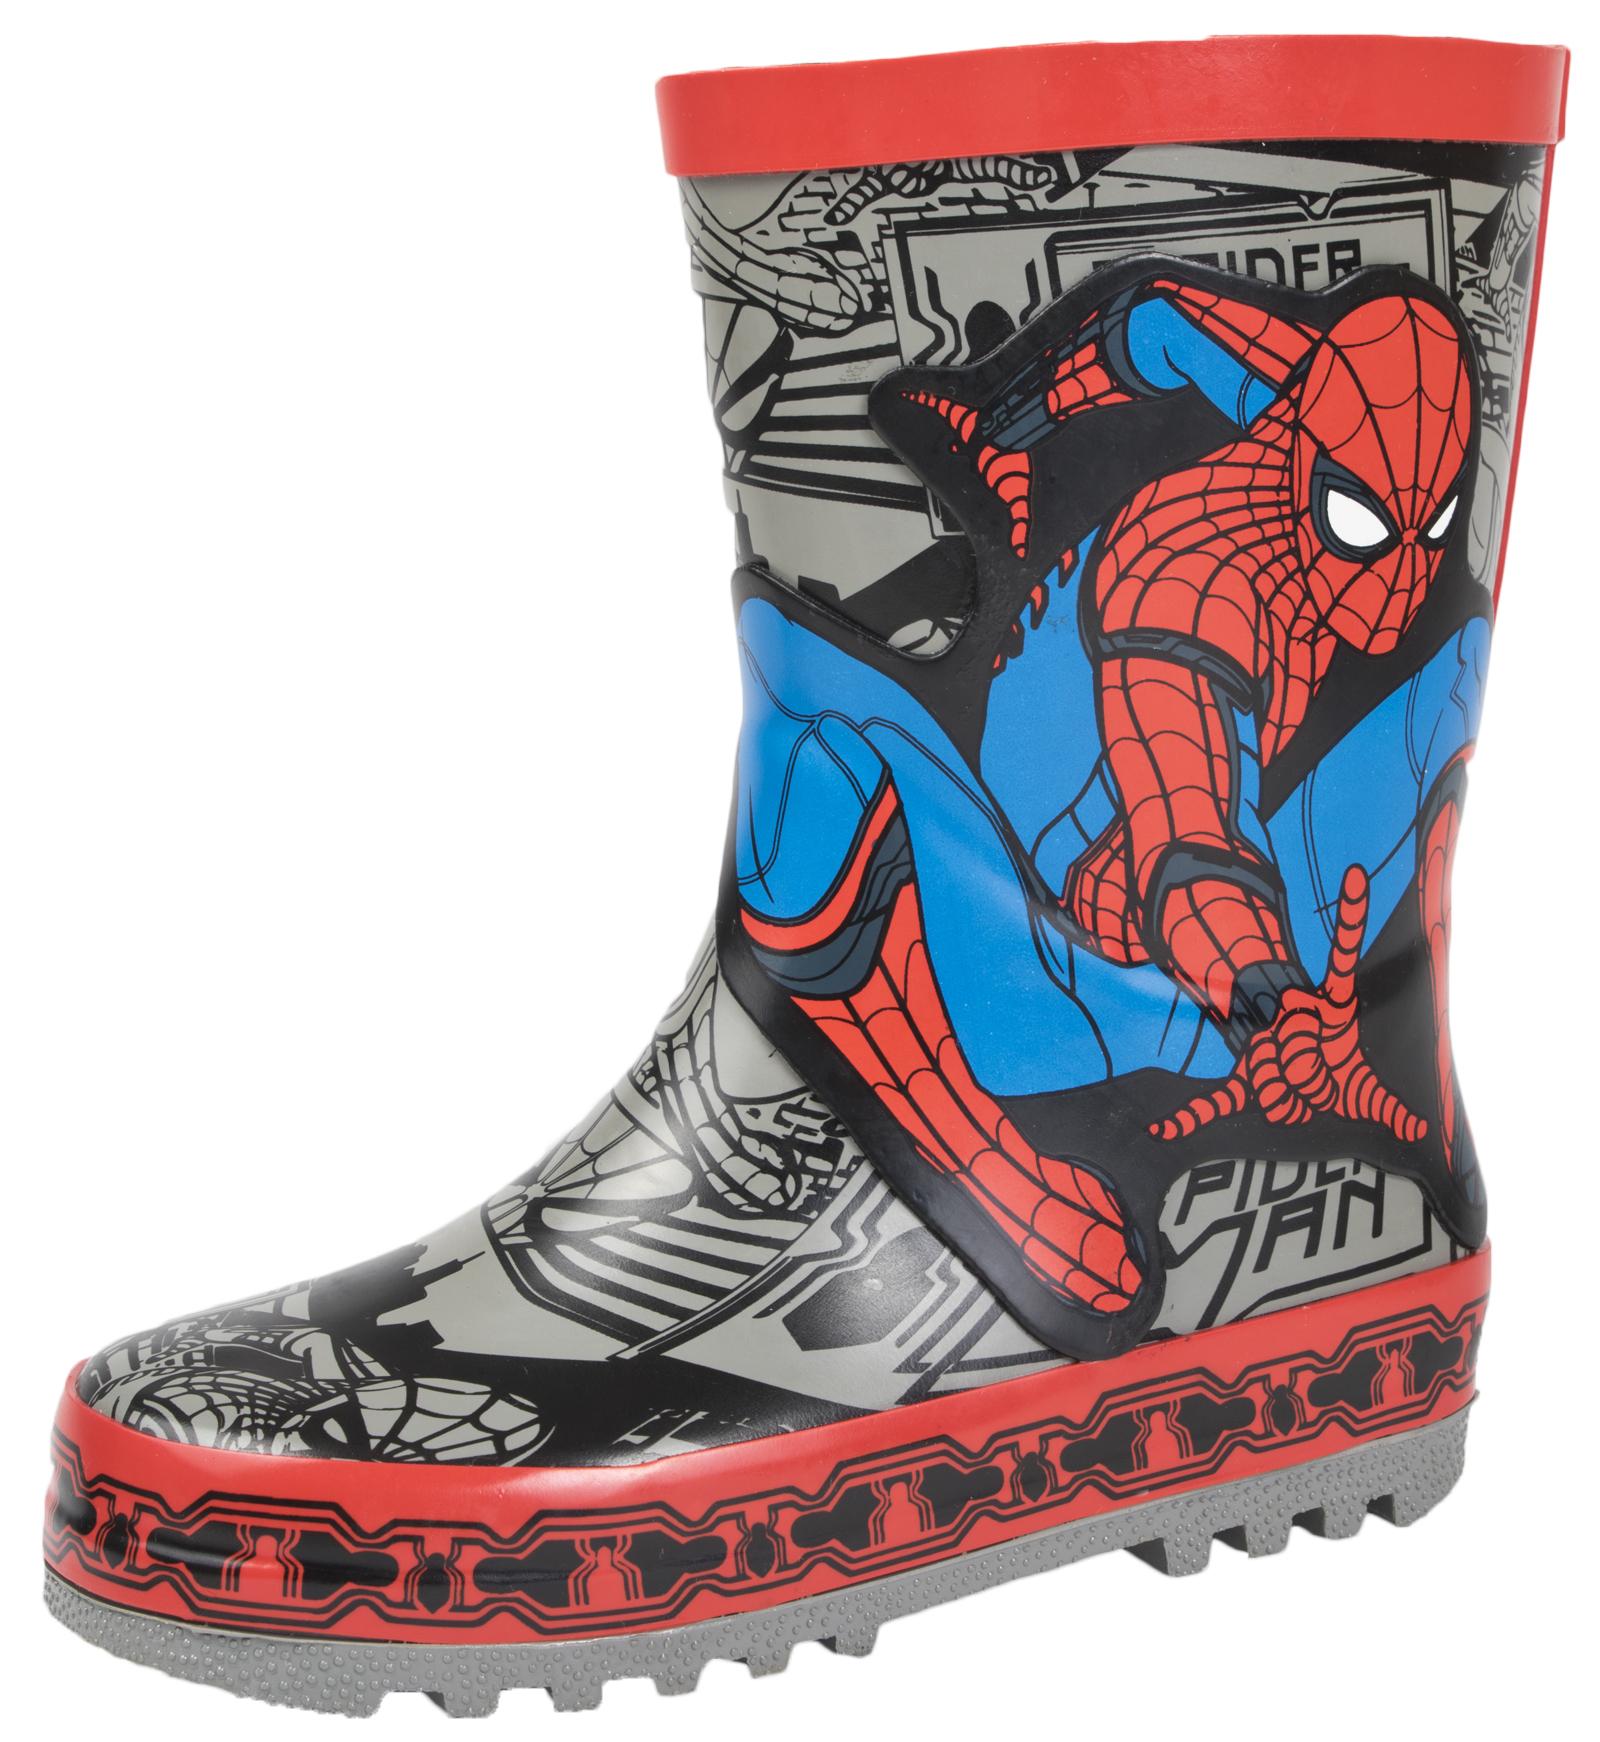 8afdfe701c7 Details about Spiderman Wellington Boots Boys Marvel Superhero Wellies  Rubber Snow Boots Size